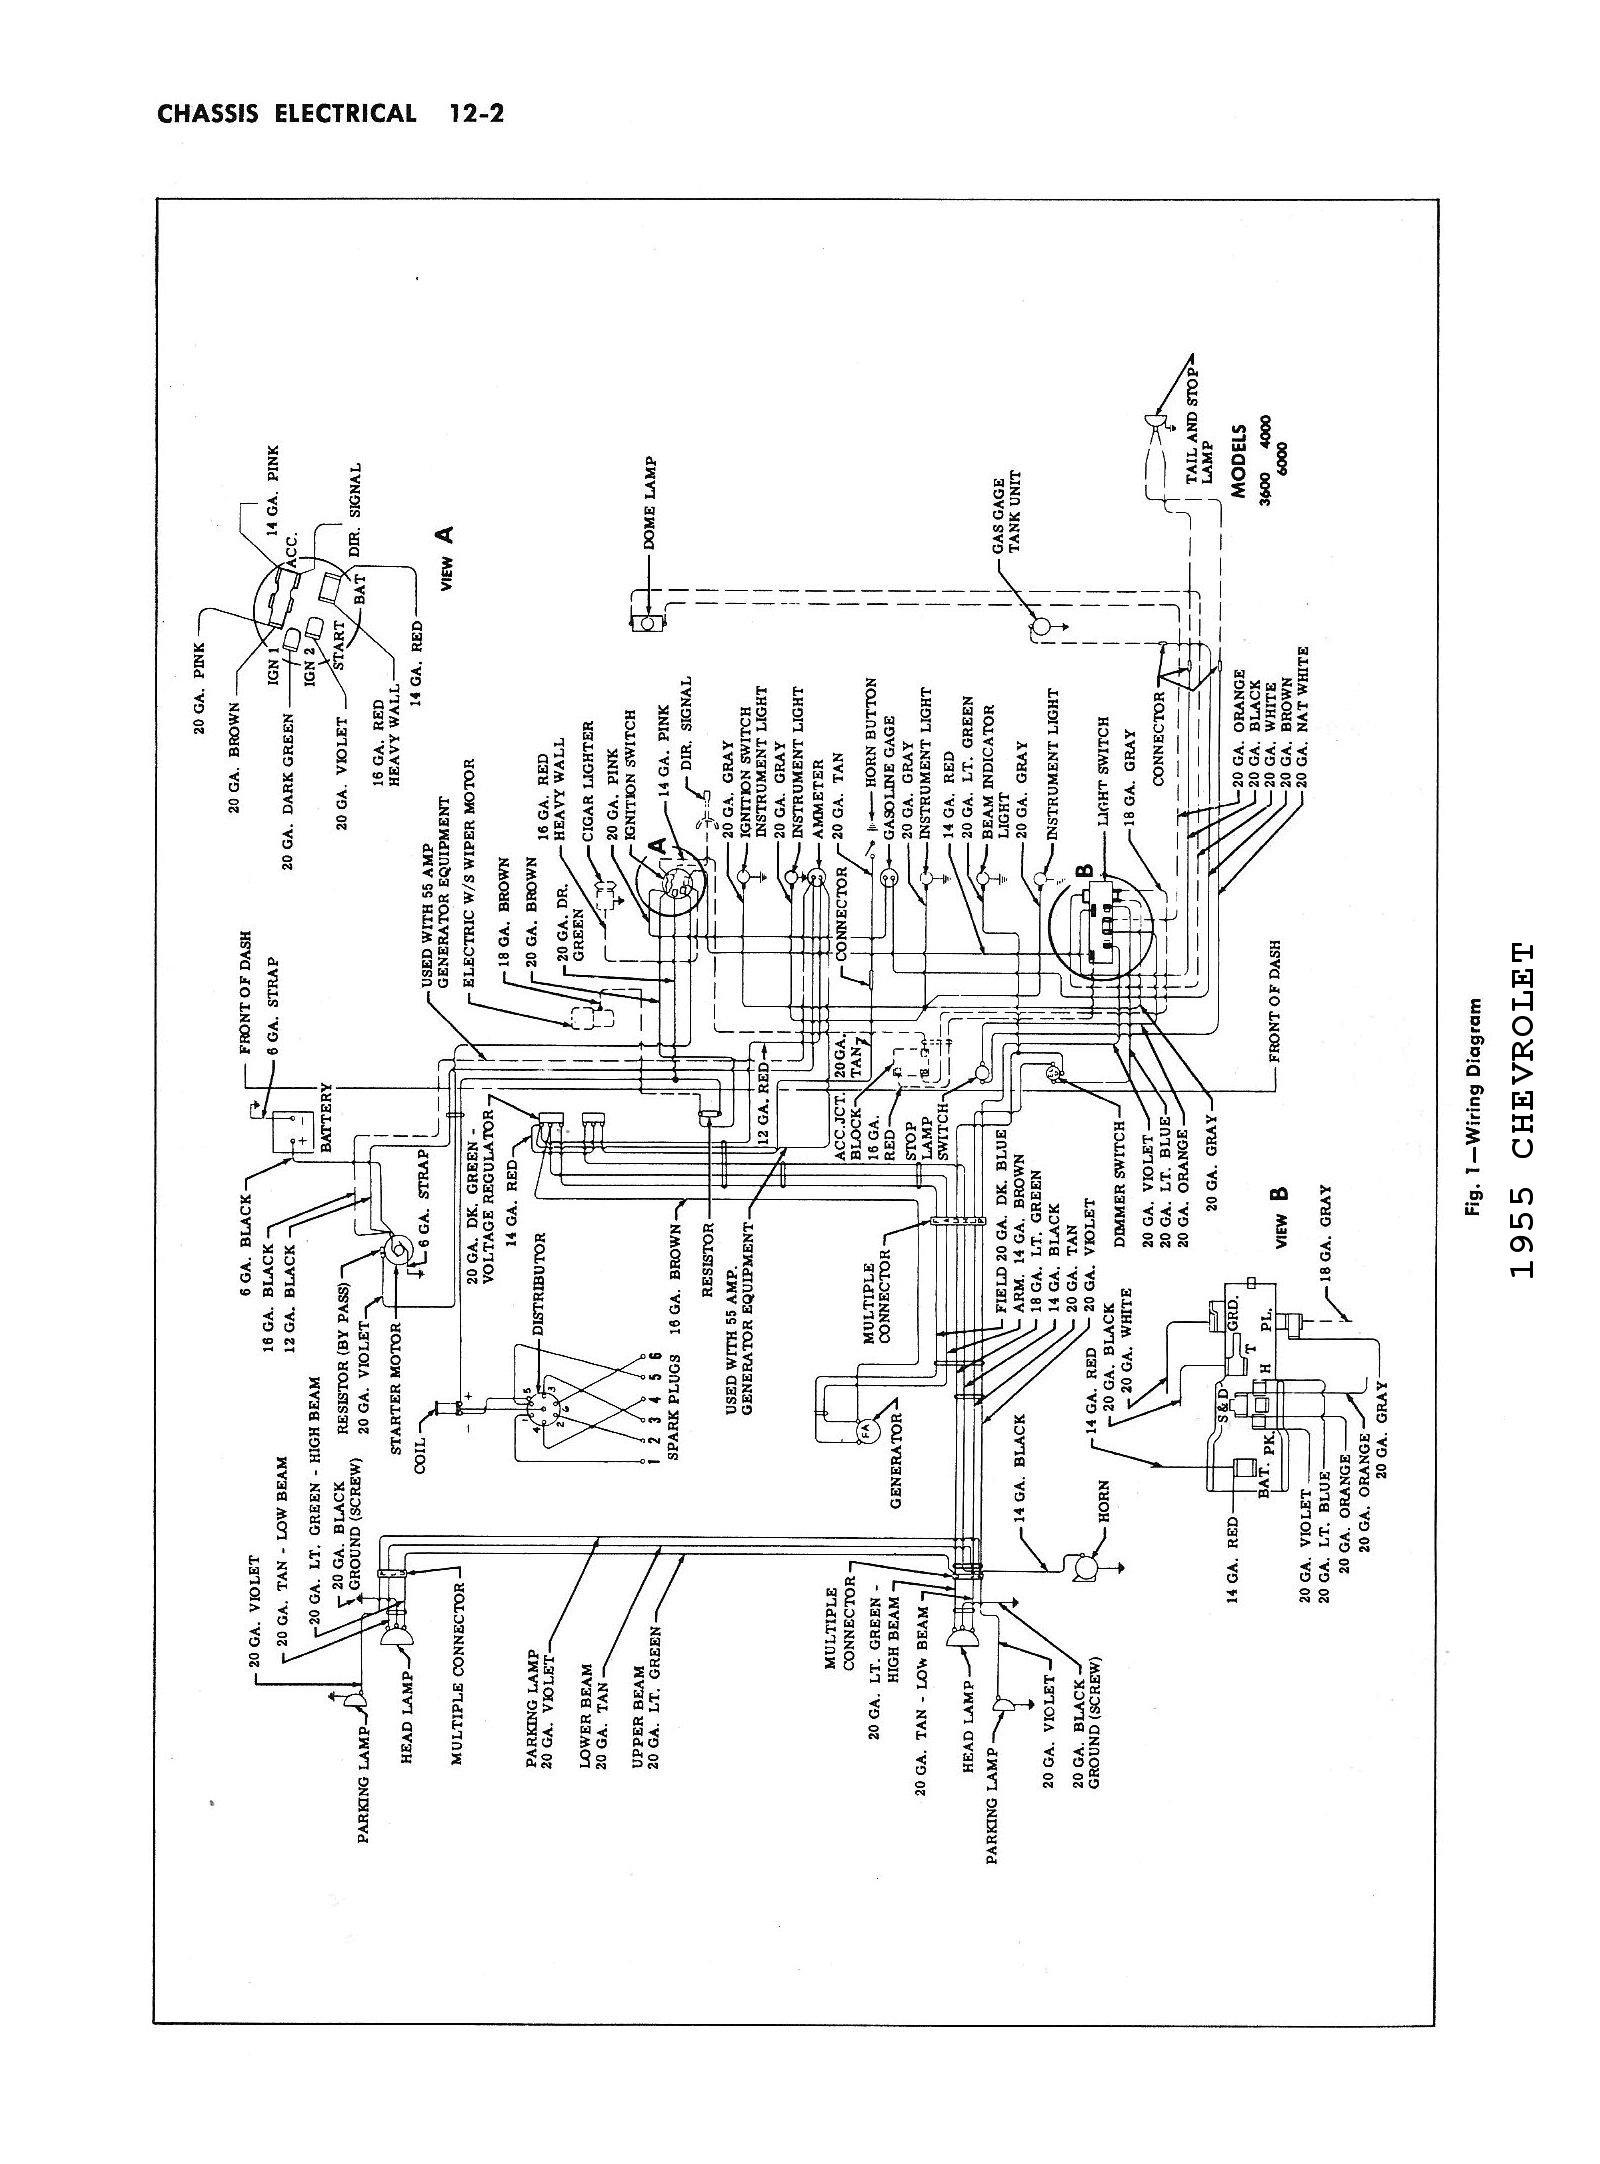 Awesome 1956 Willys Wagon Wiring Diagram Wiring Diagram Data Schema Wiring Cloud Dulfrecoveryedborg